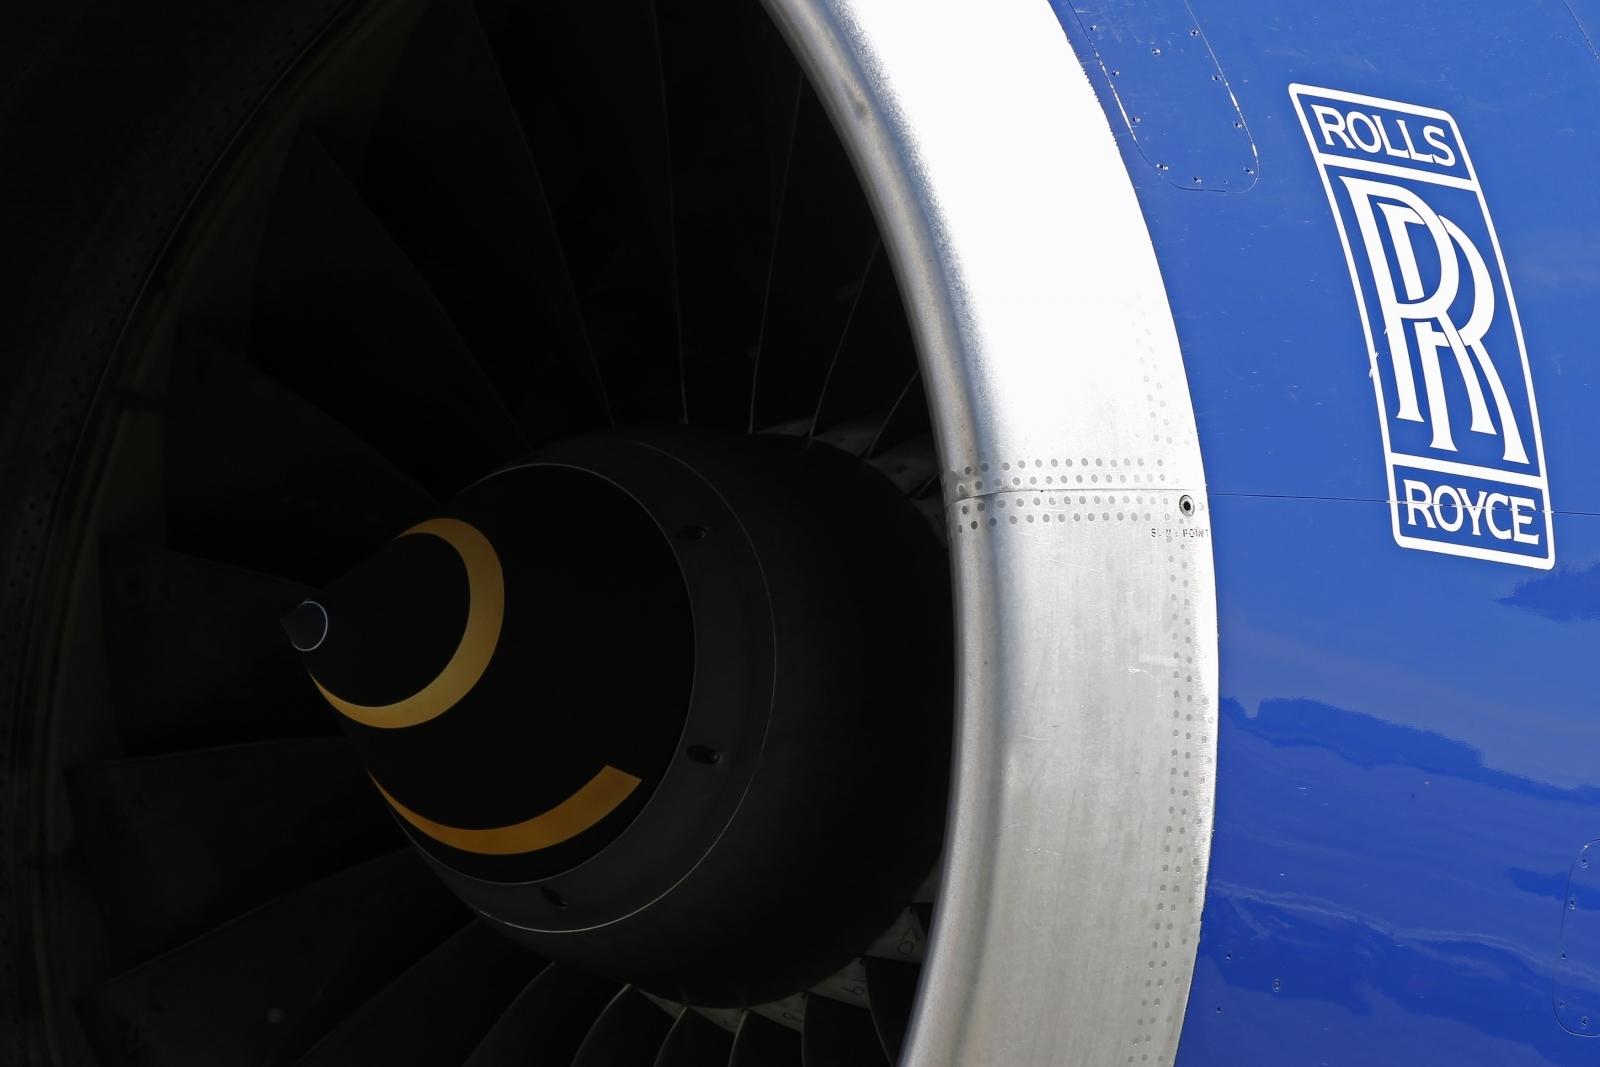 Rolls Royce turbine